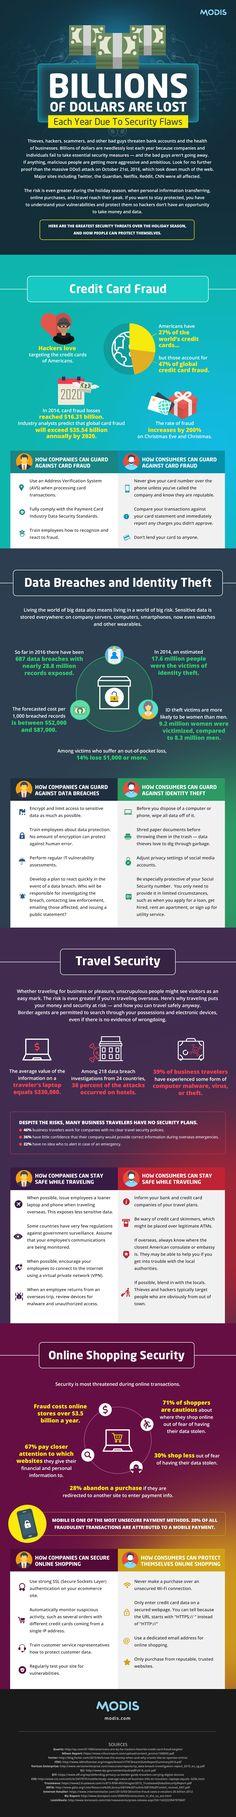 Avoid a Financially Devastating Cyber Security Breach